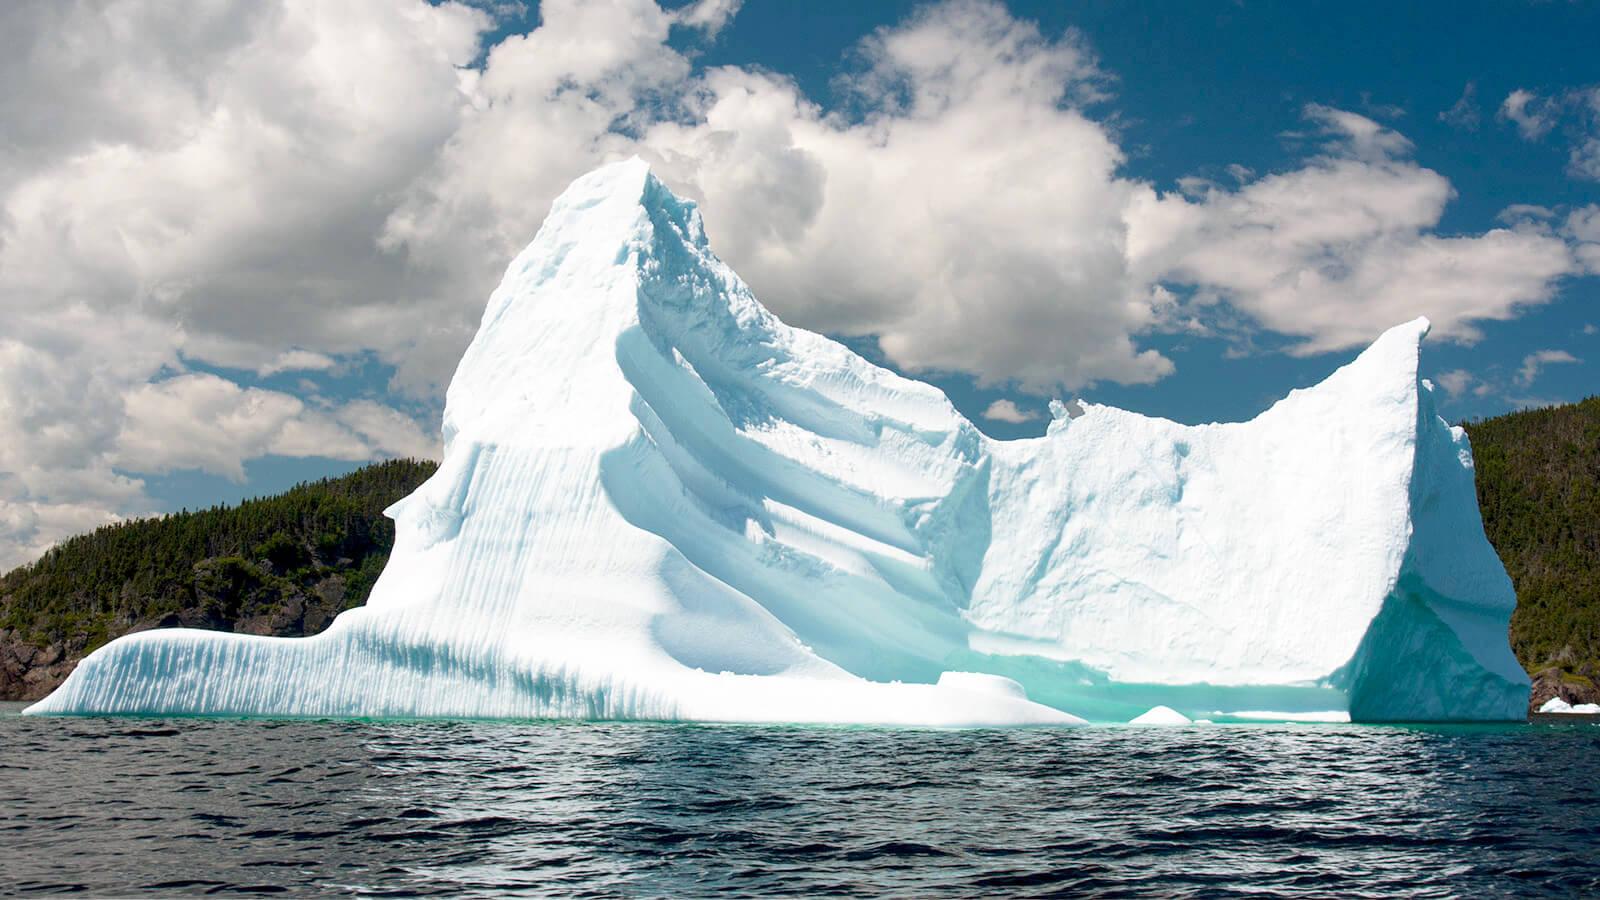 6 Ways to Enjoy Iceberg Season<br>in St. John's - image